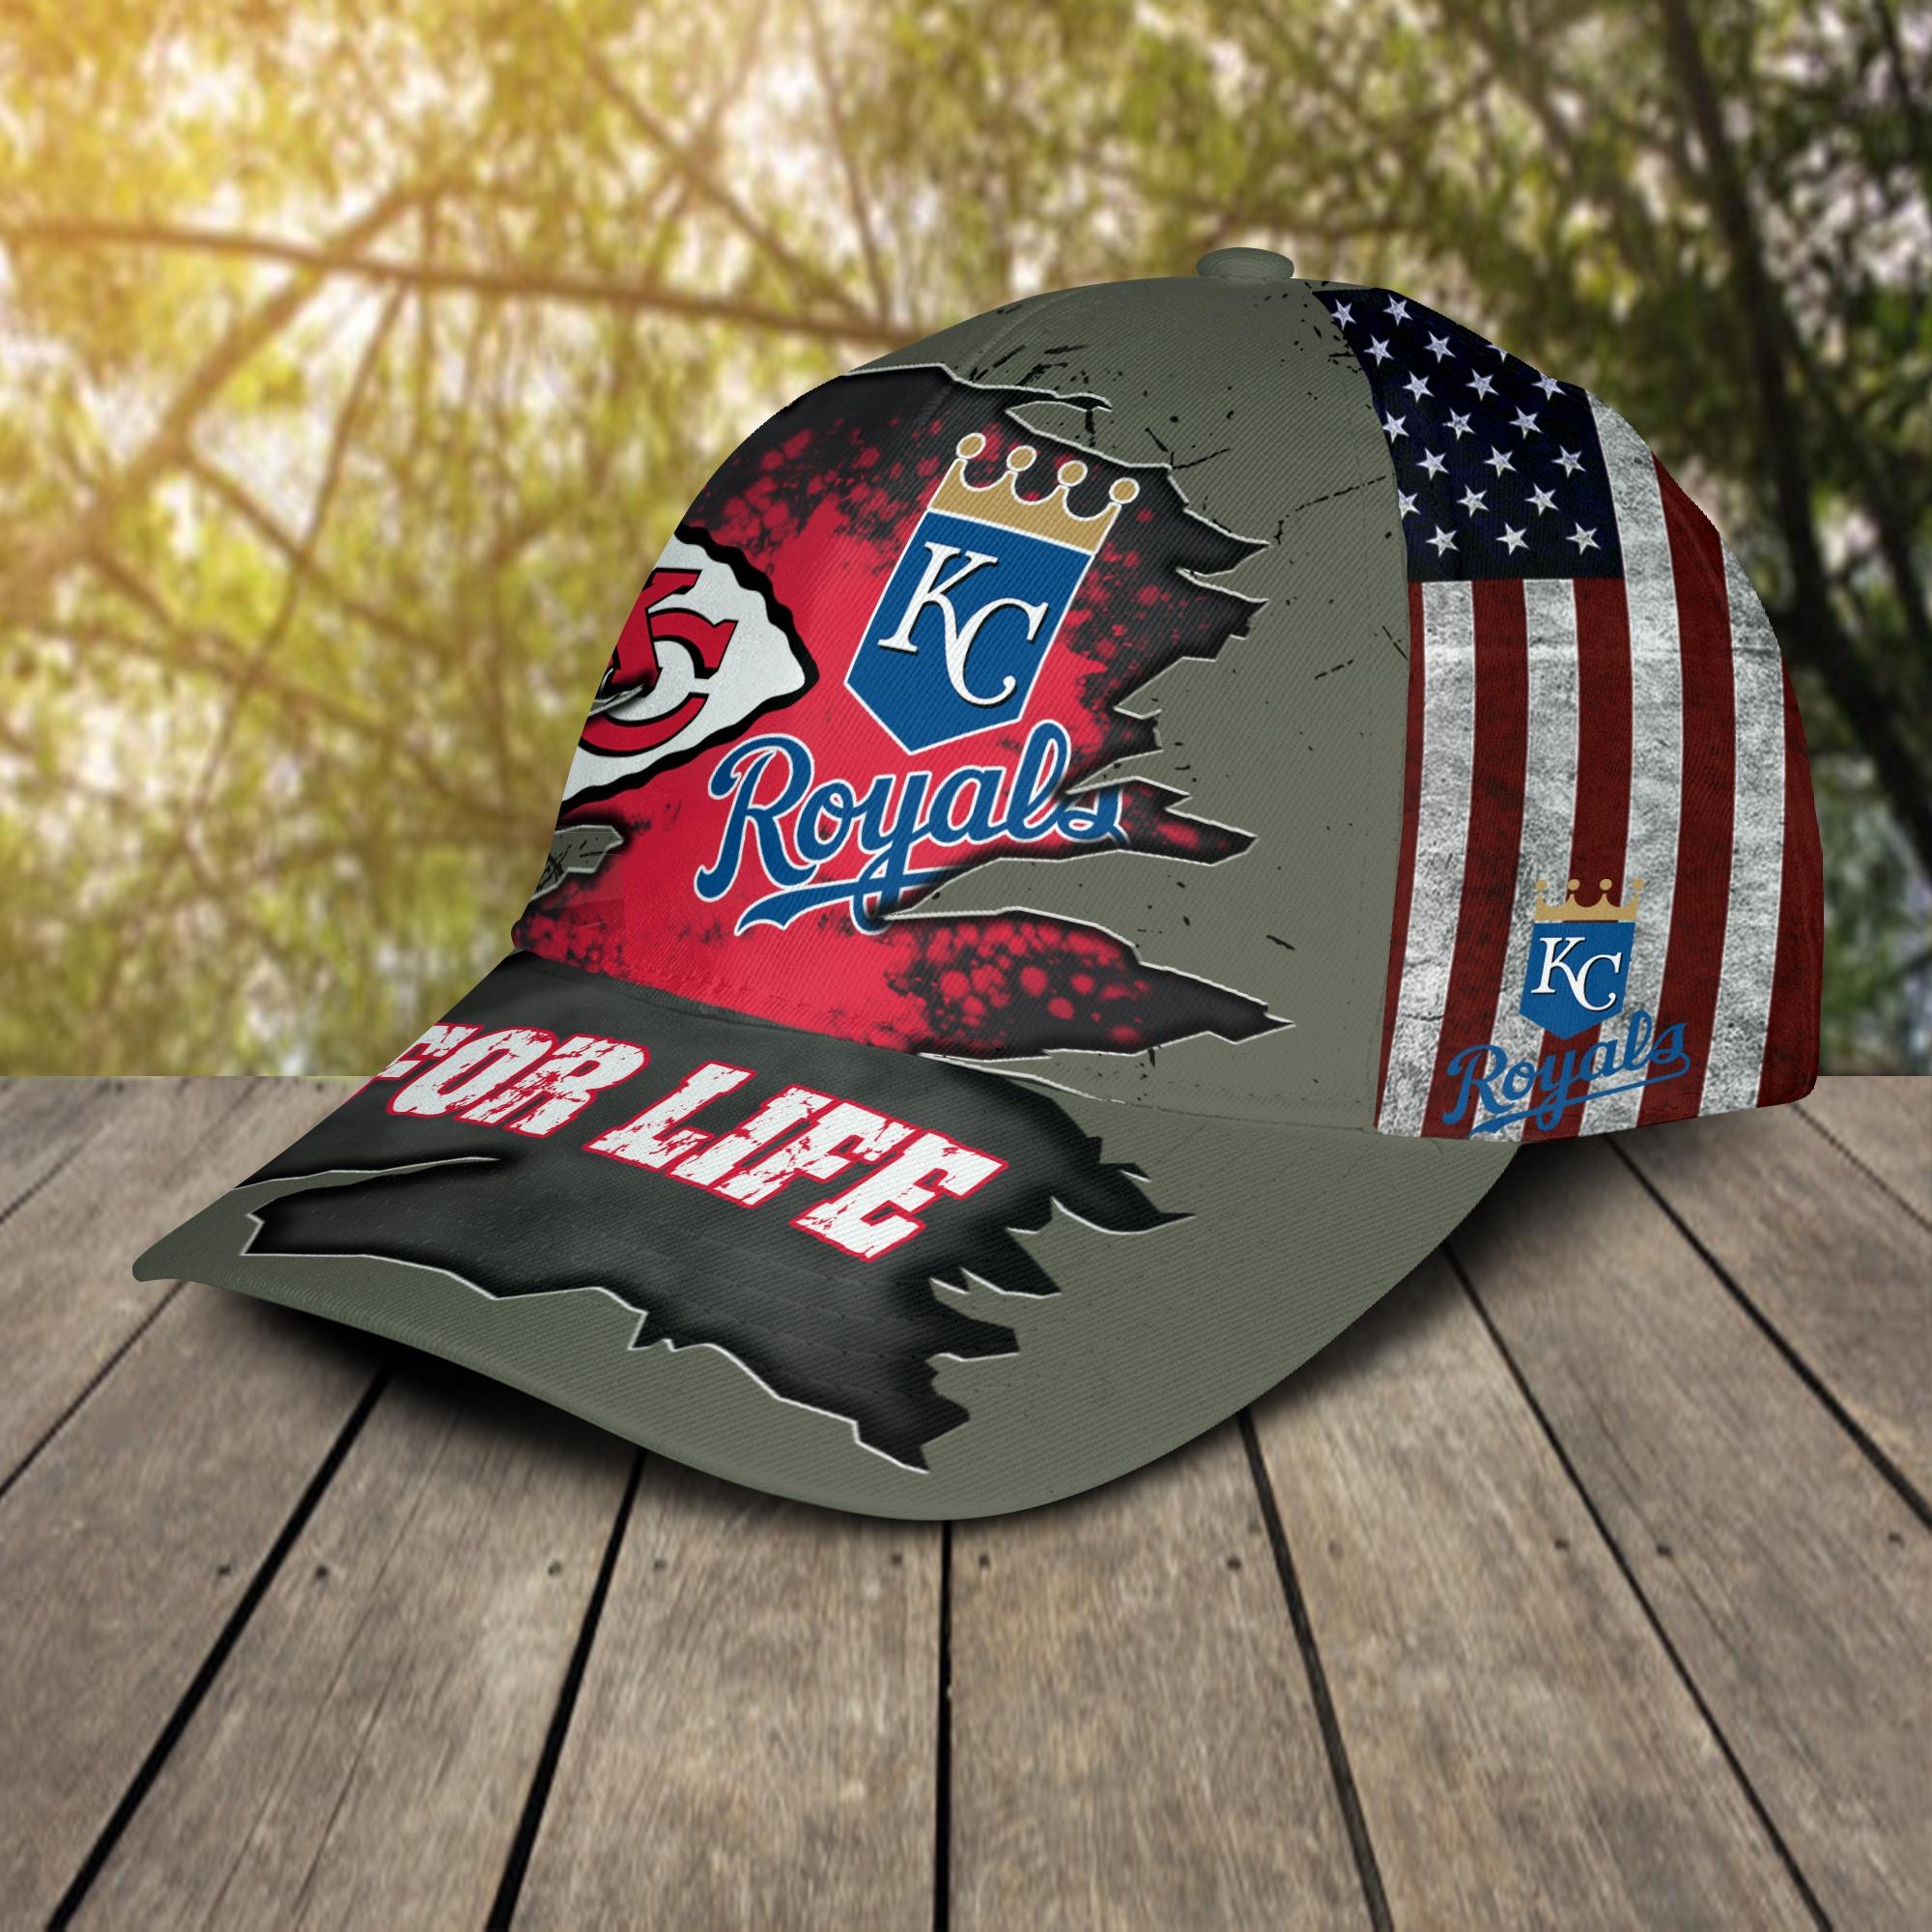 Kansas city chiefs and kansas city royals for life cap 2